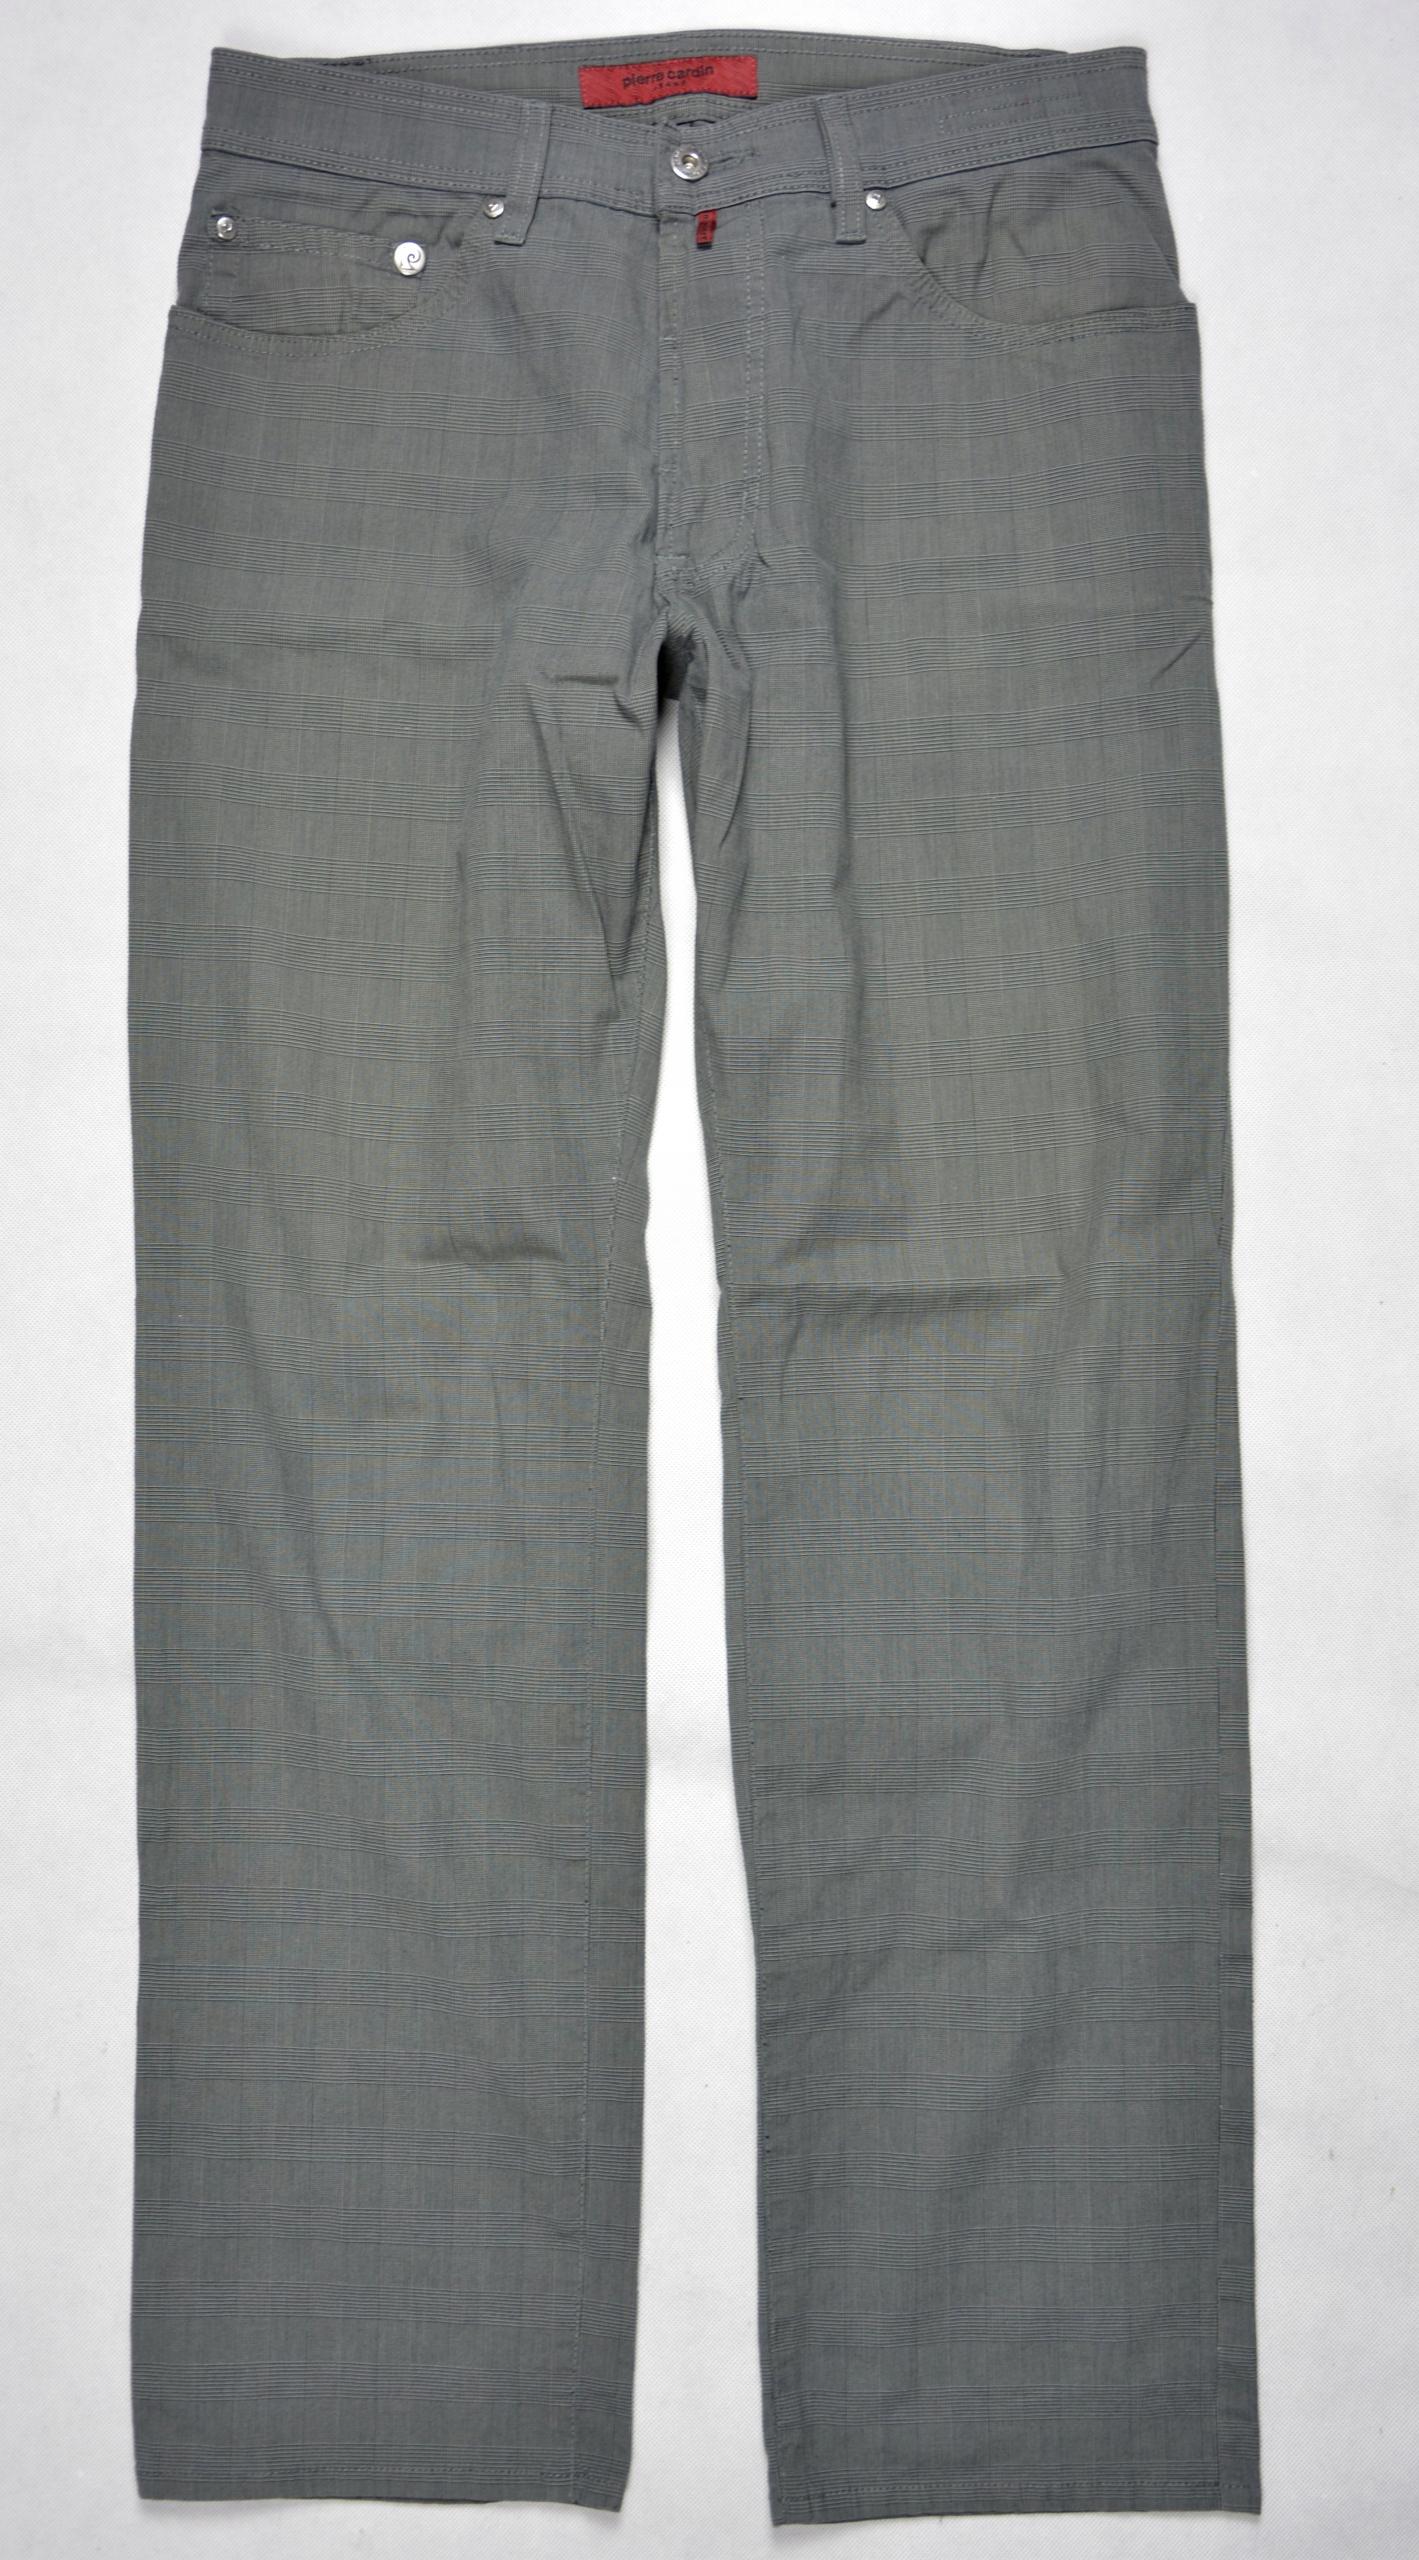 Spodnie PIERRE CARDIN m. Deauville r.33/32 pas 82